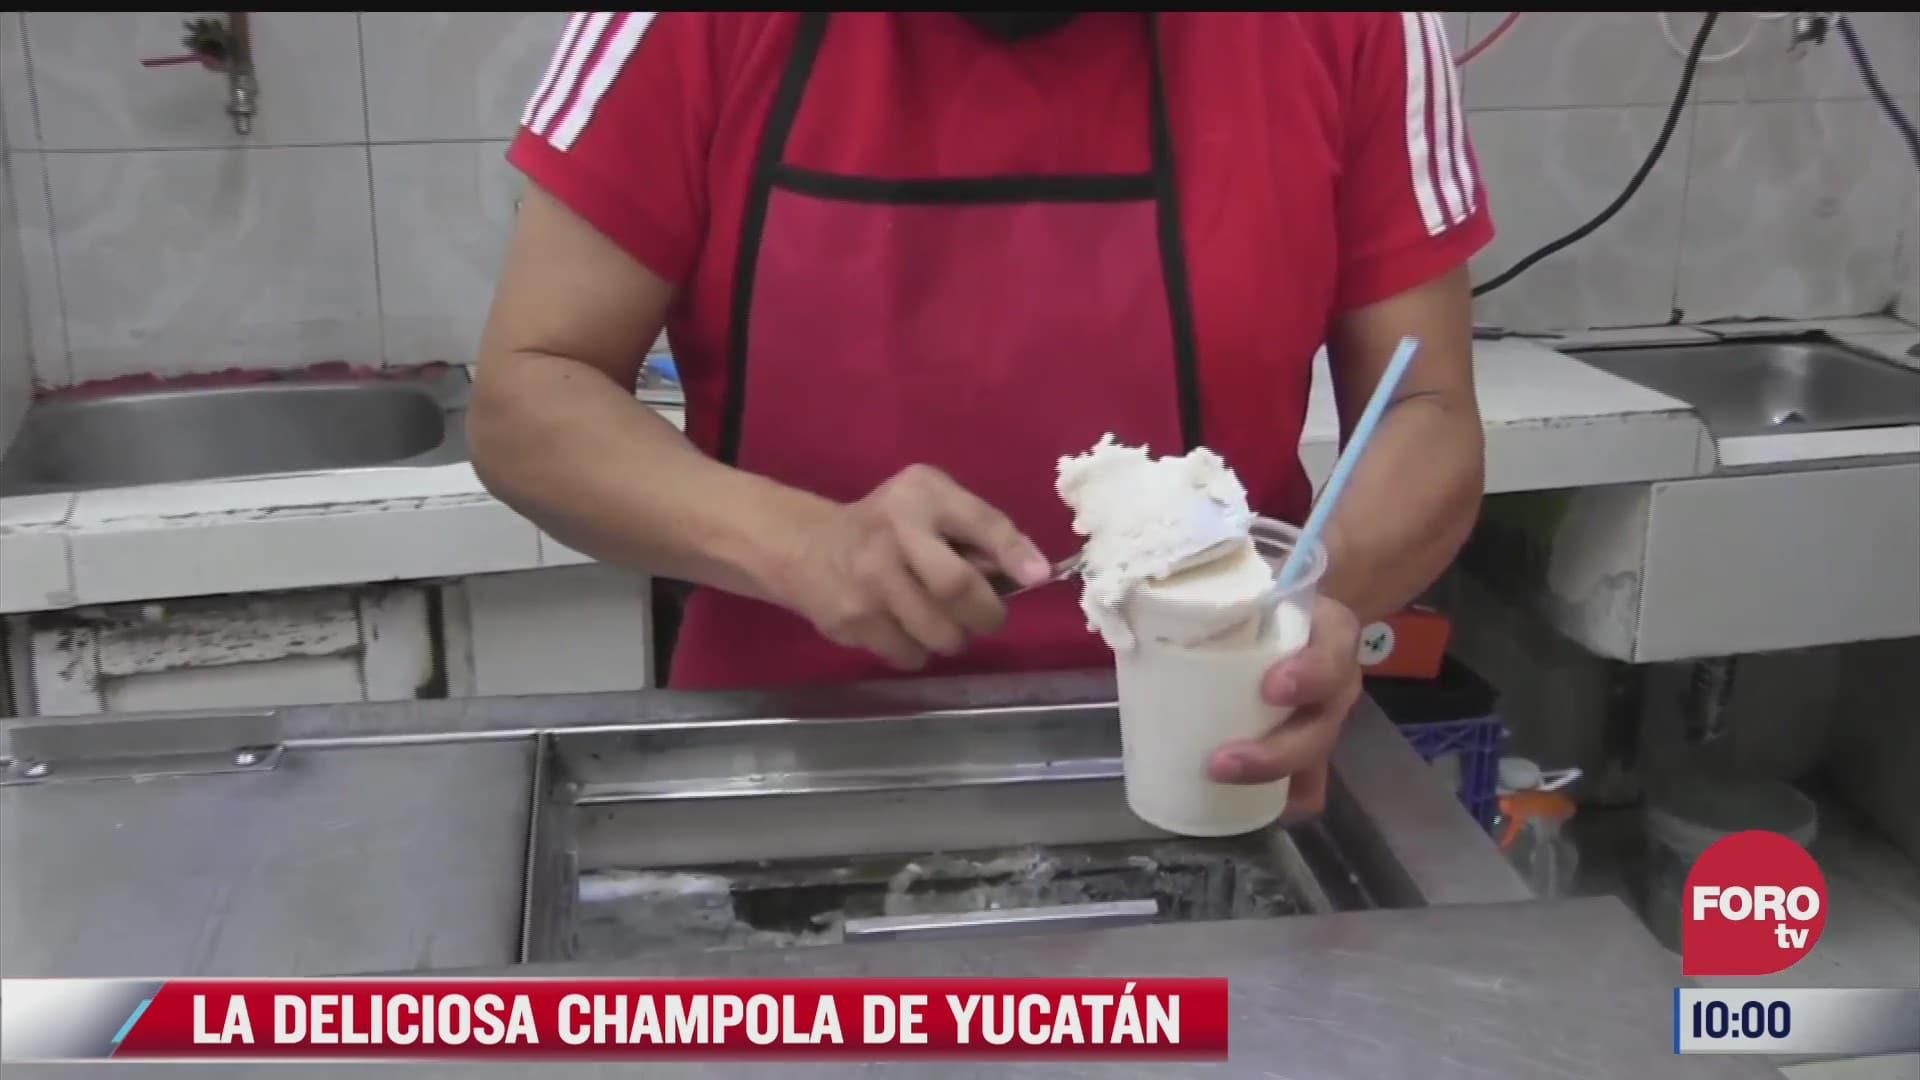 champola forma parte del patrimonio cultural intangible de yucatan